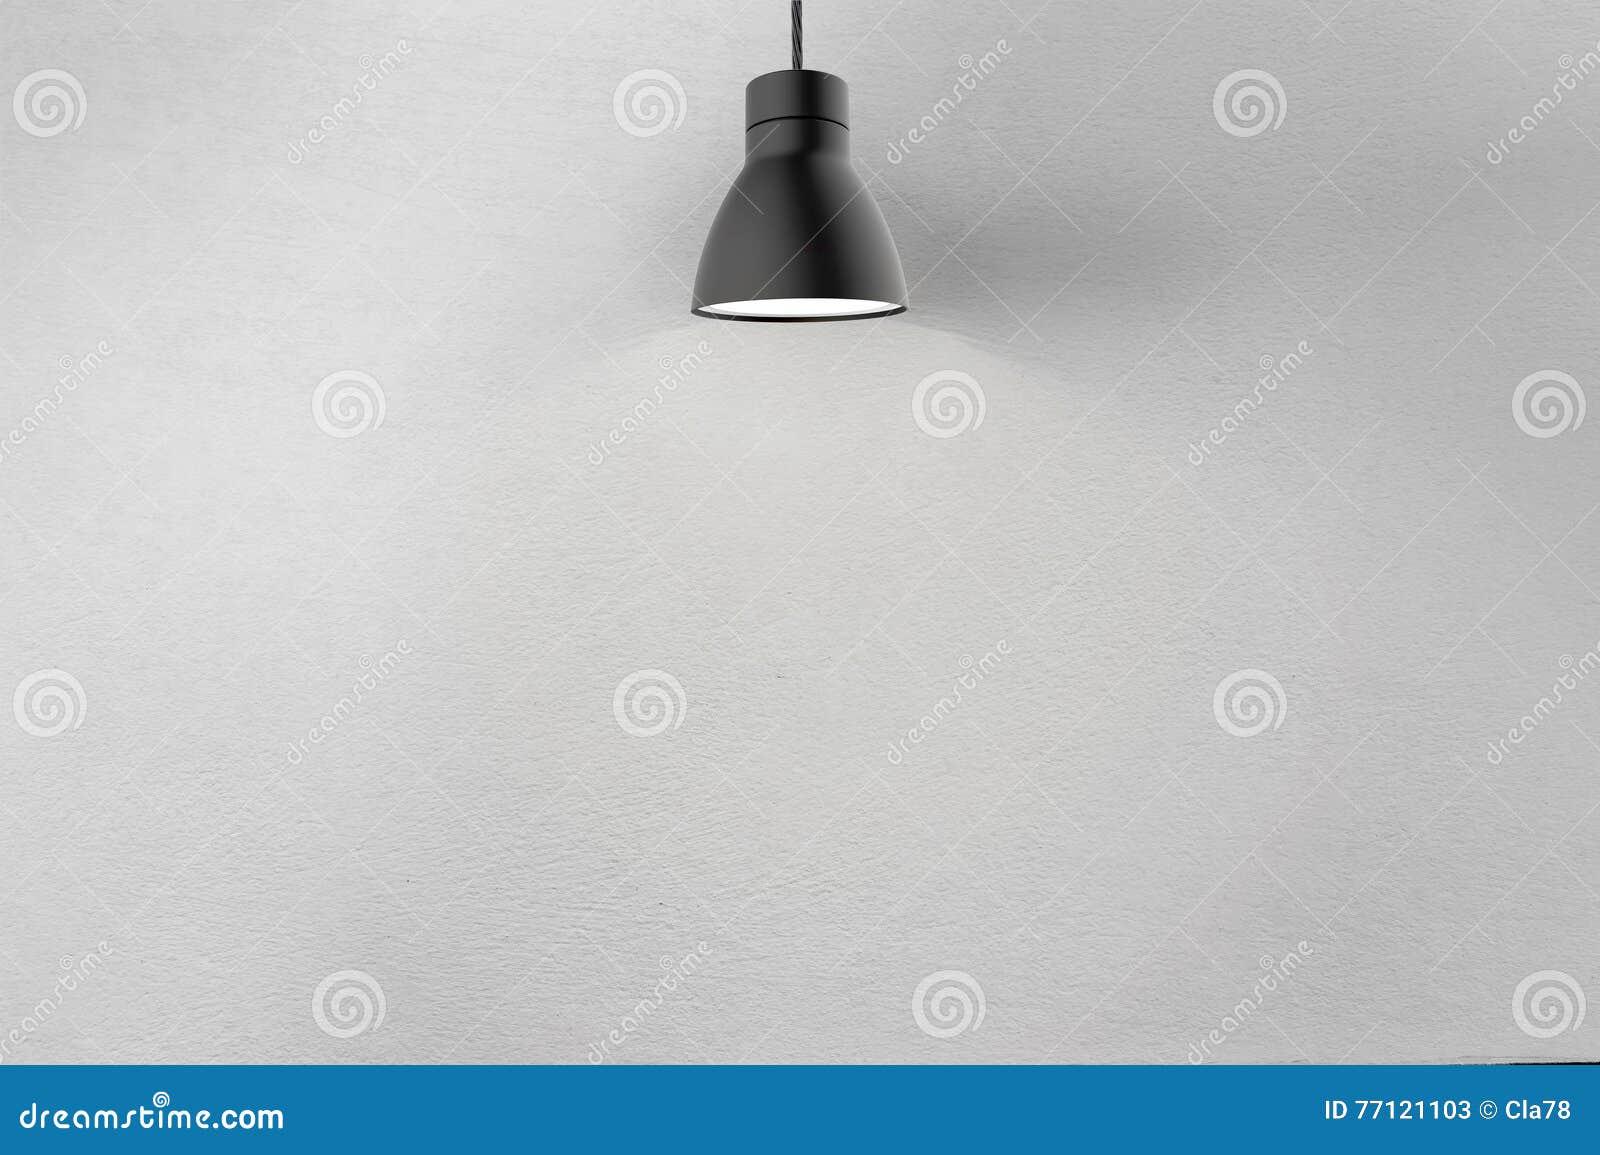 Muro de cimento e lâmpada do teto